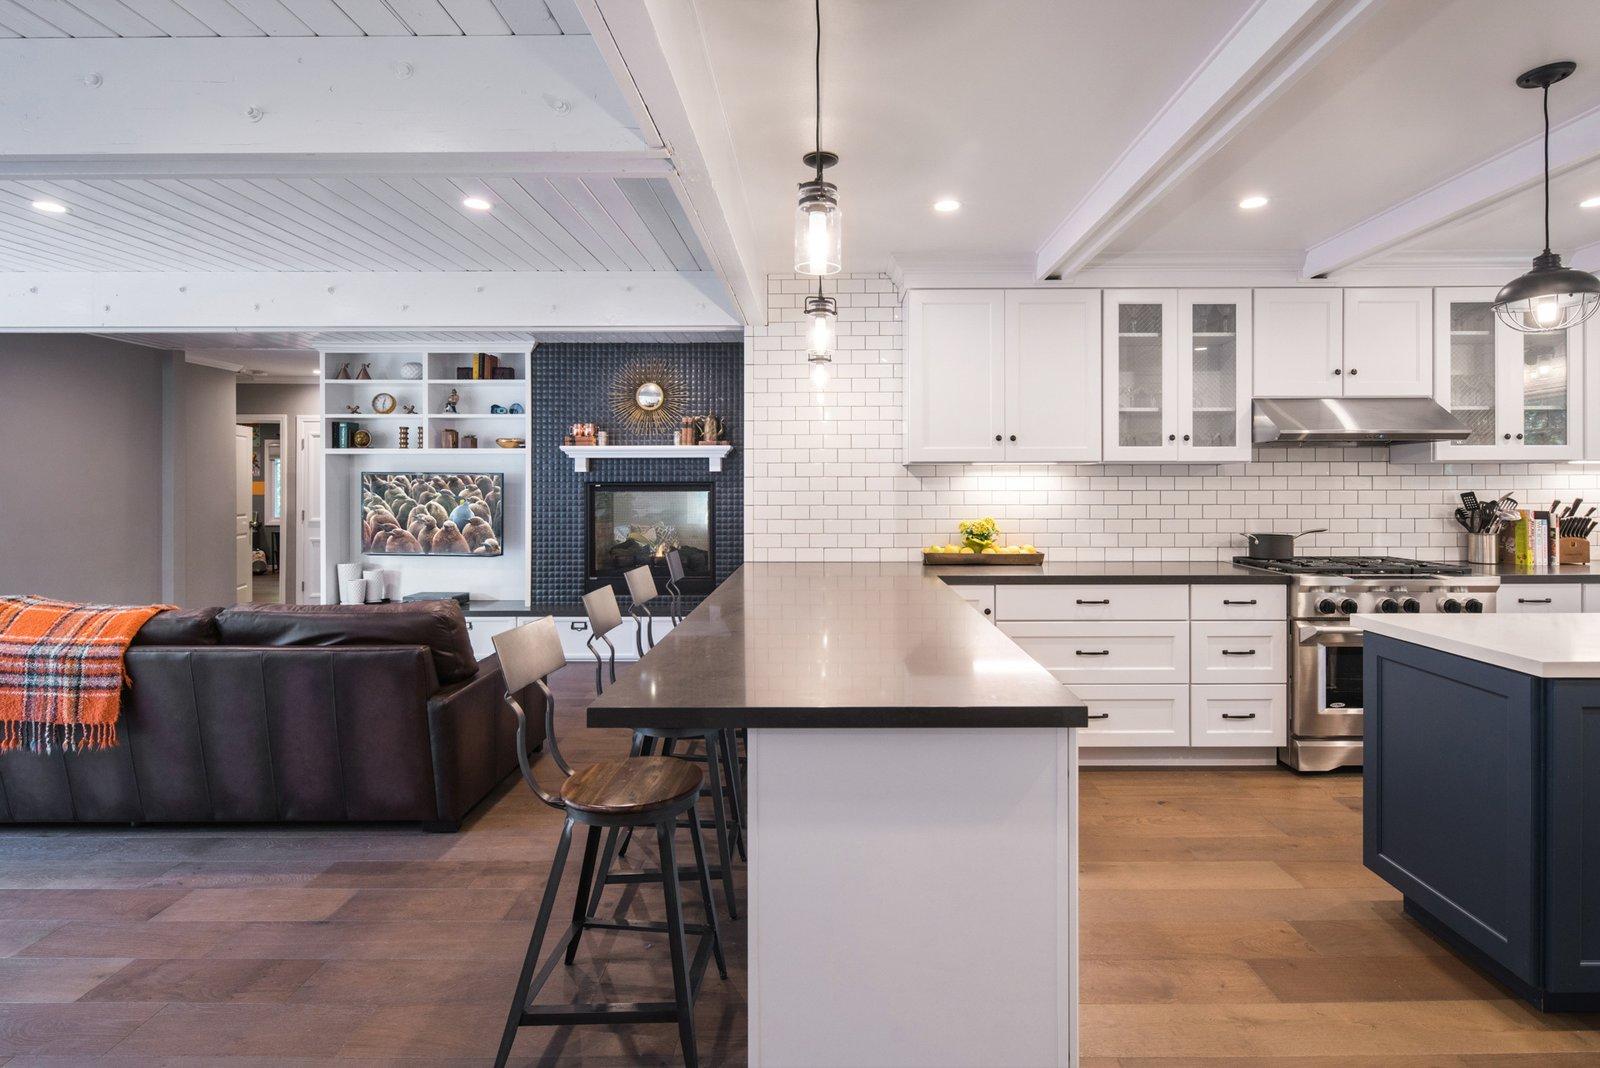 Subway Tile, Ceiling, White, Pendant, Sofa, Kitchen, Standard Layout, Medium Hardwood, Range Hood, Engineered Quartz, and Range  Best Kitchen Standard Layout Range Photos from The Pasadena Farmhouse